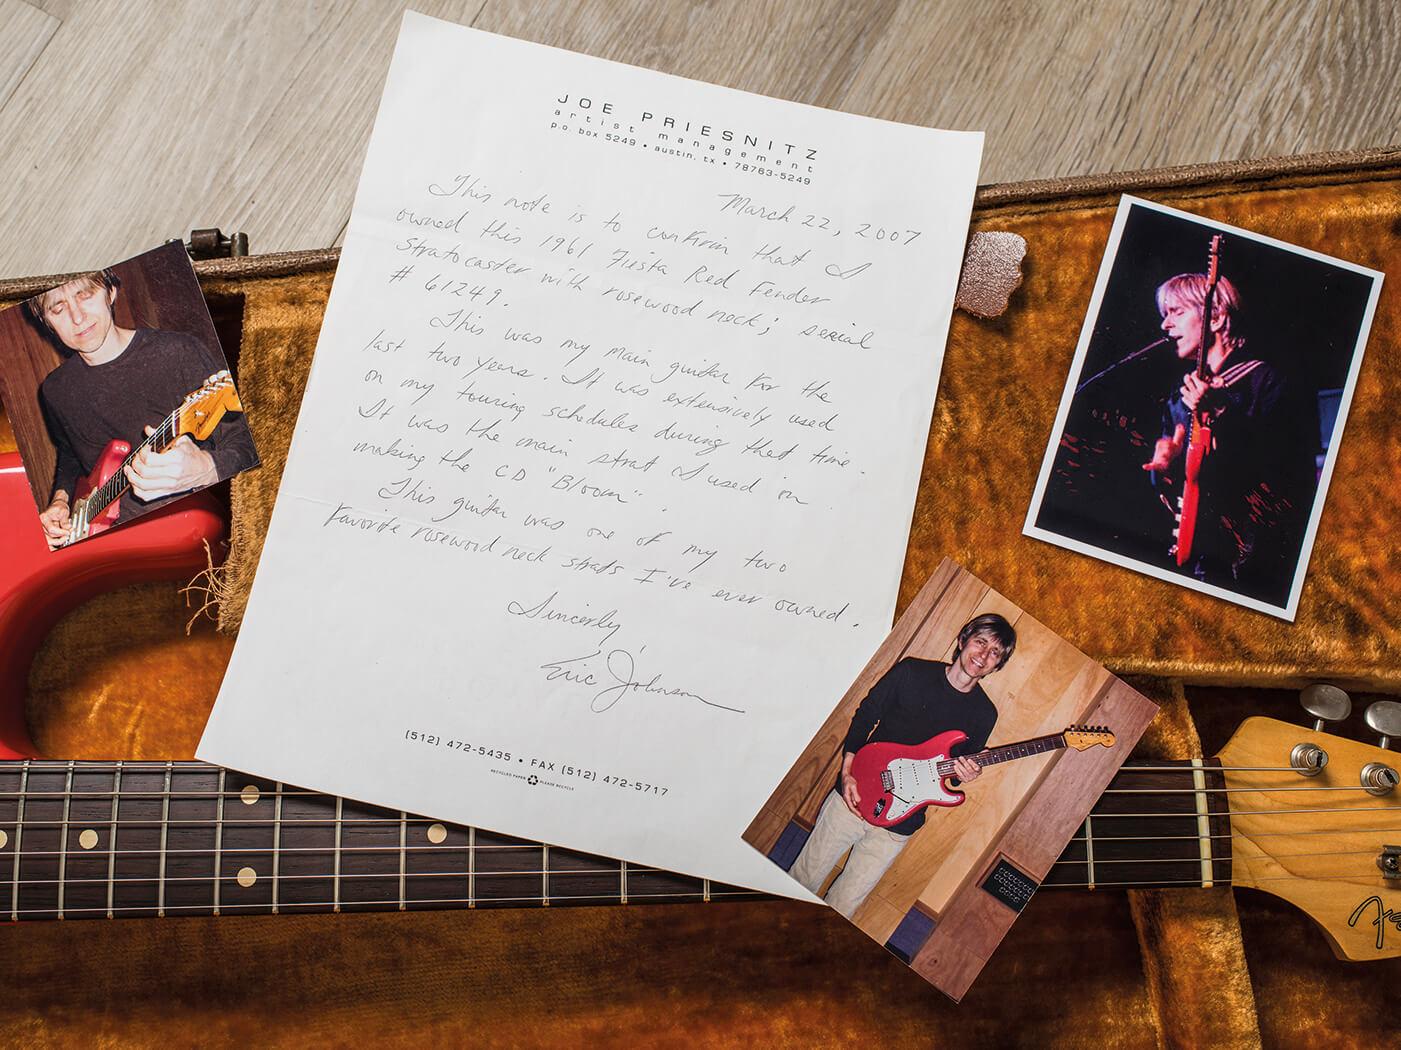 Fender Pre-CBS Fiesta Red Strat Eric Johnson memorabilia